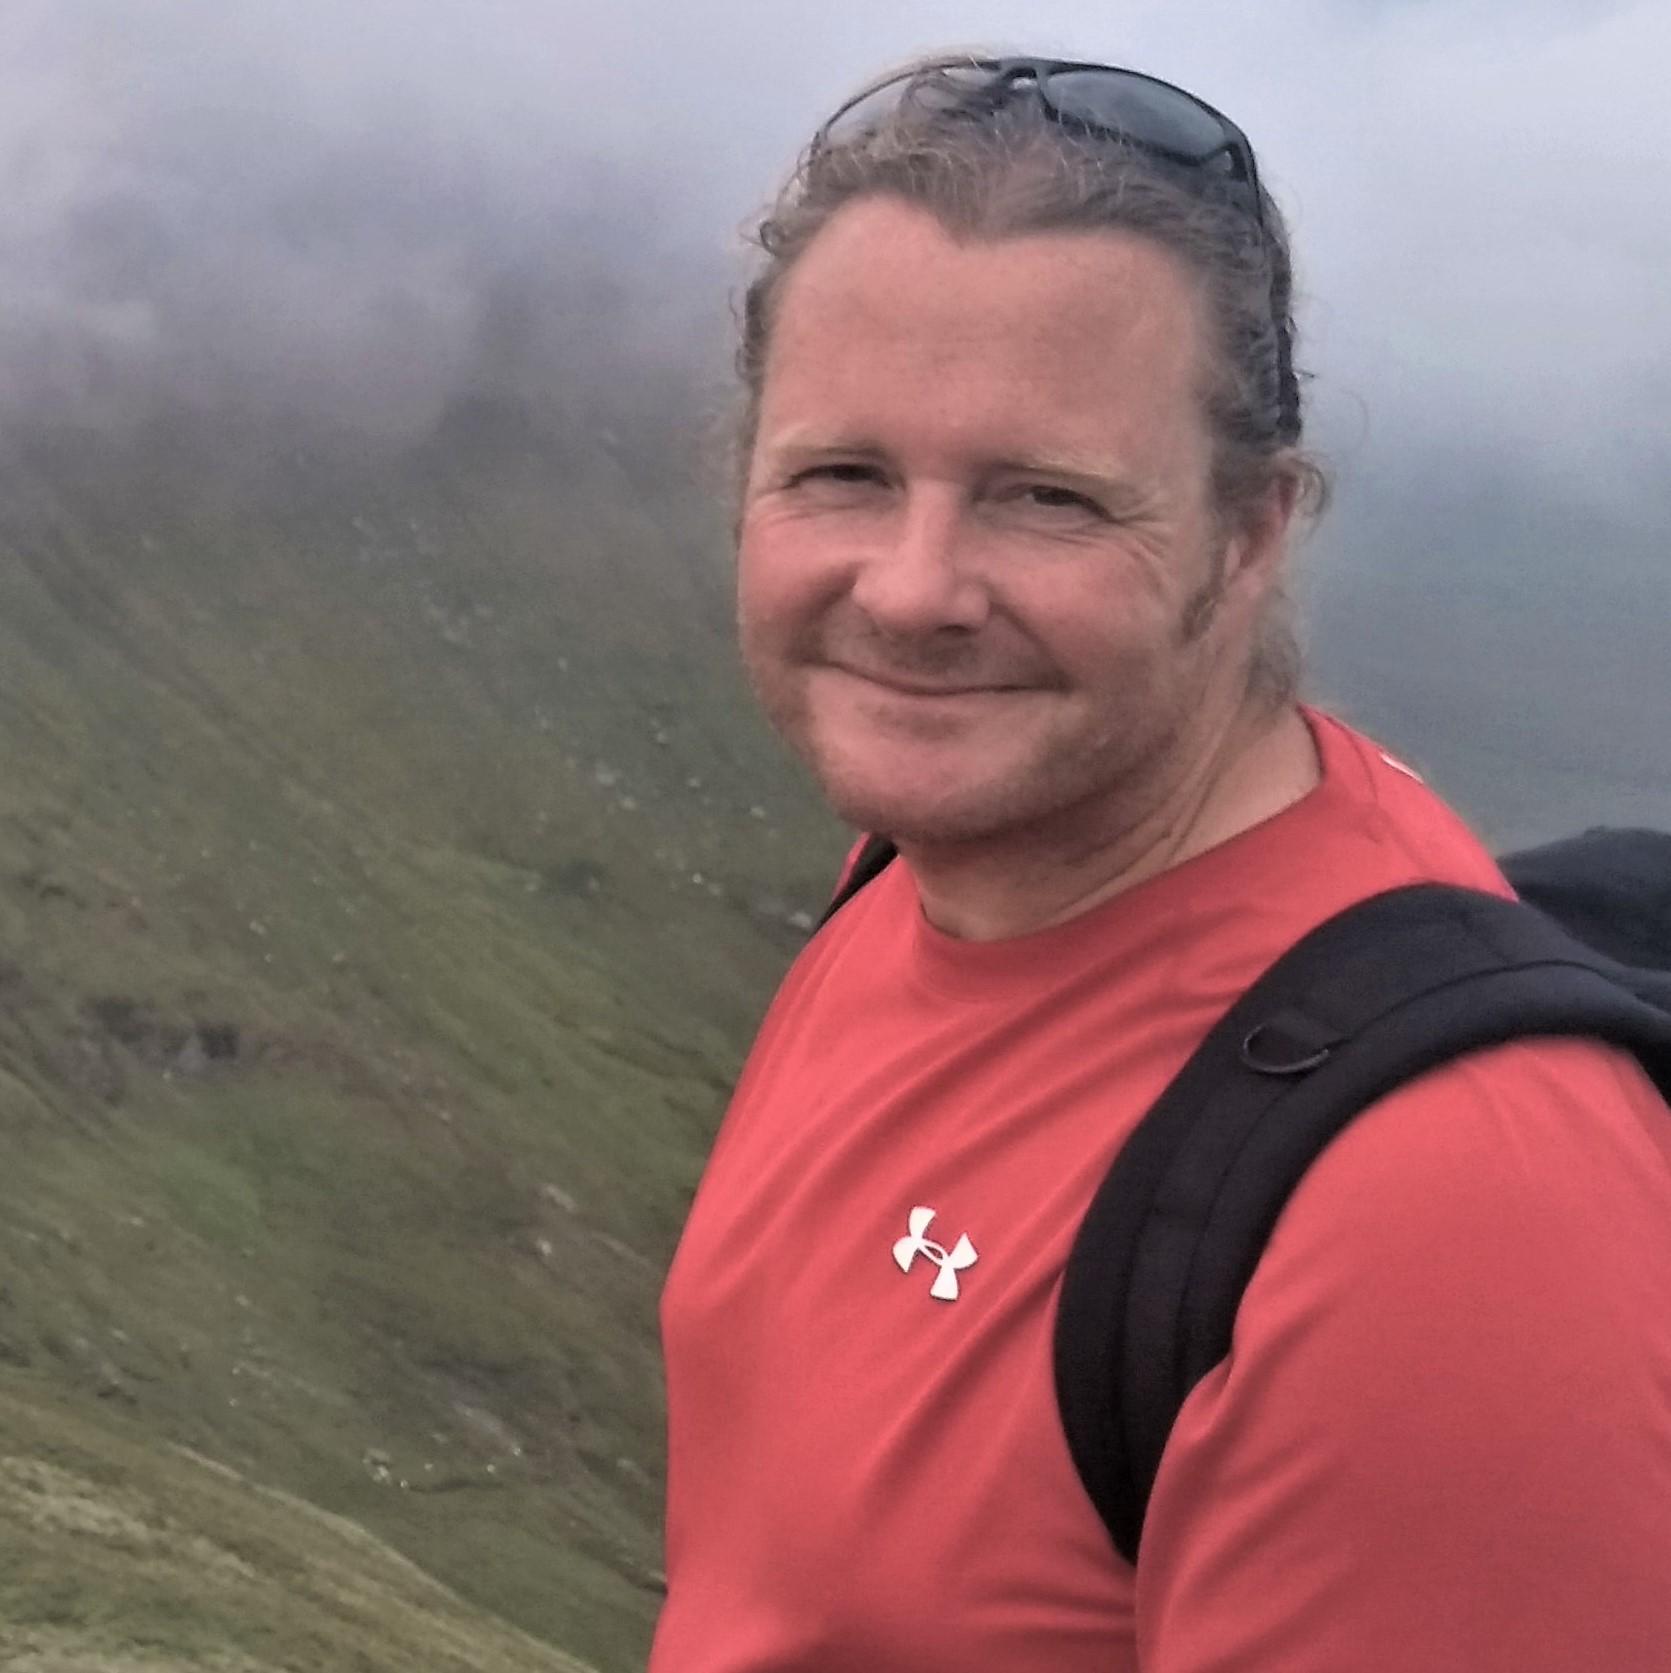 Brendan-OConnor-Techfynder